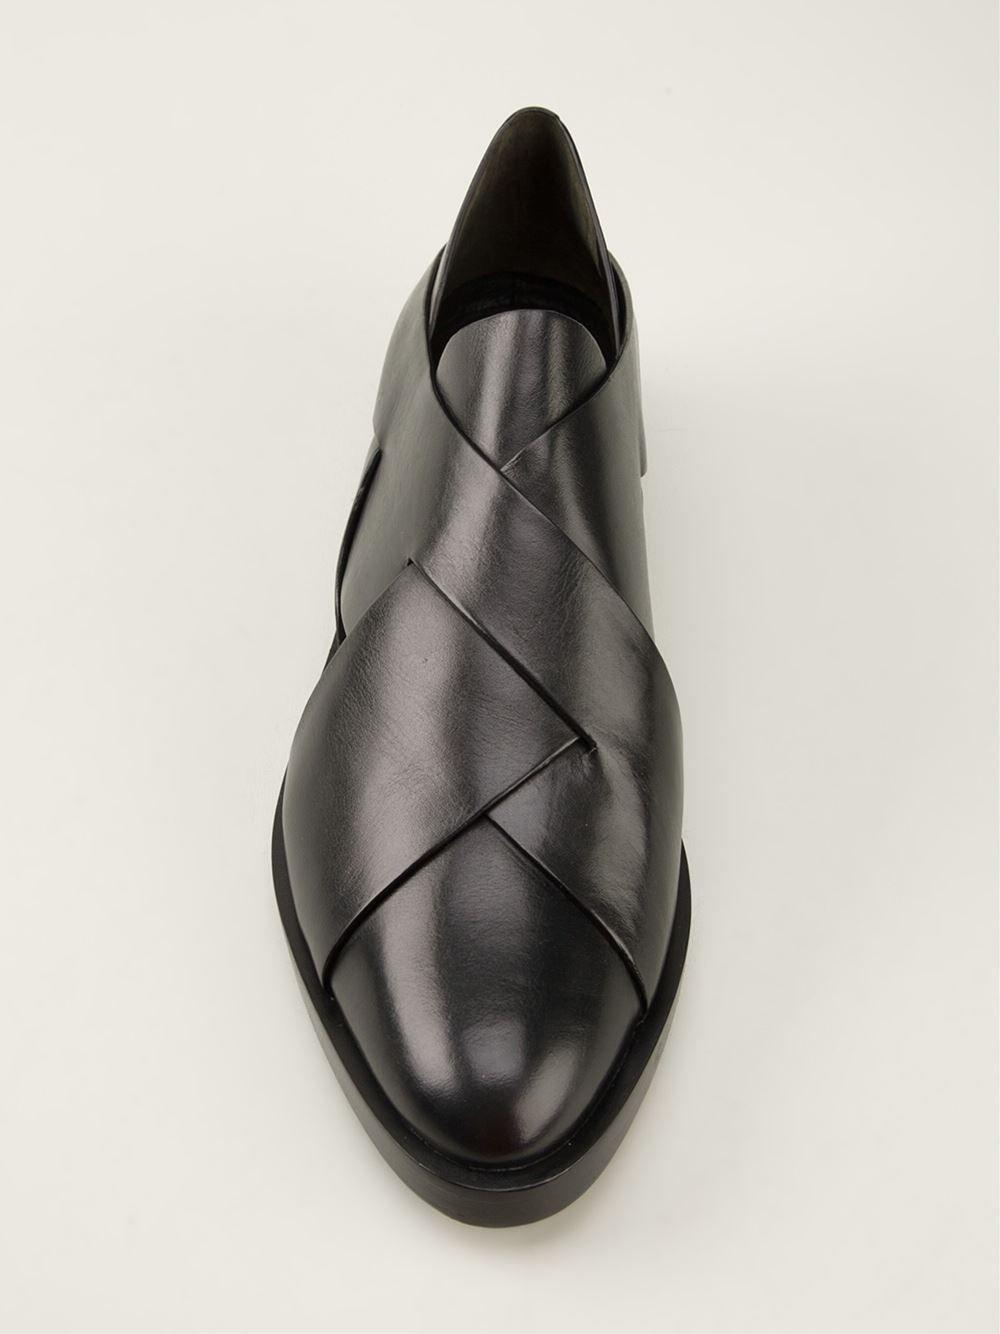 01244edee05 Alexander Wang `morgan` Loafers - Feathers - Farfetch.com